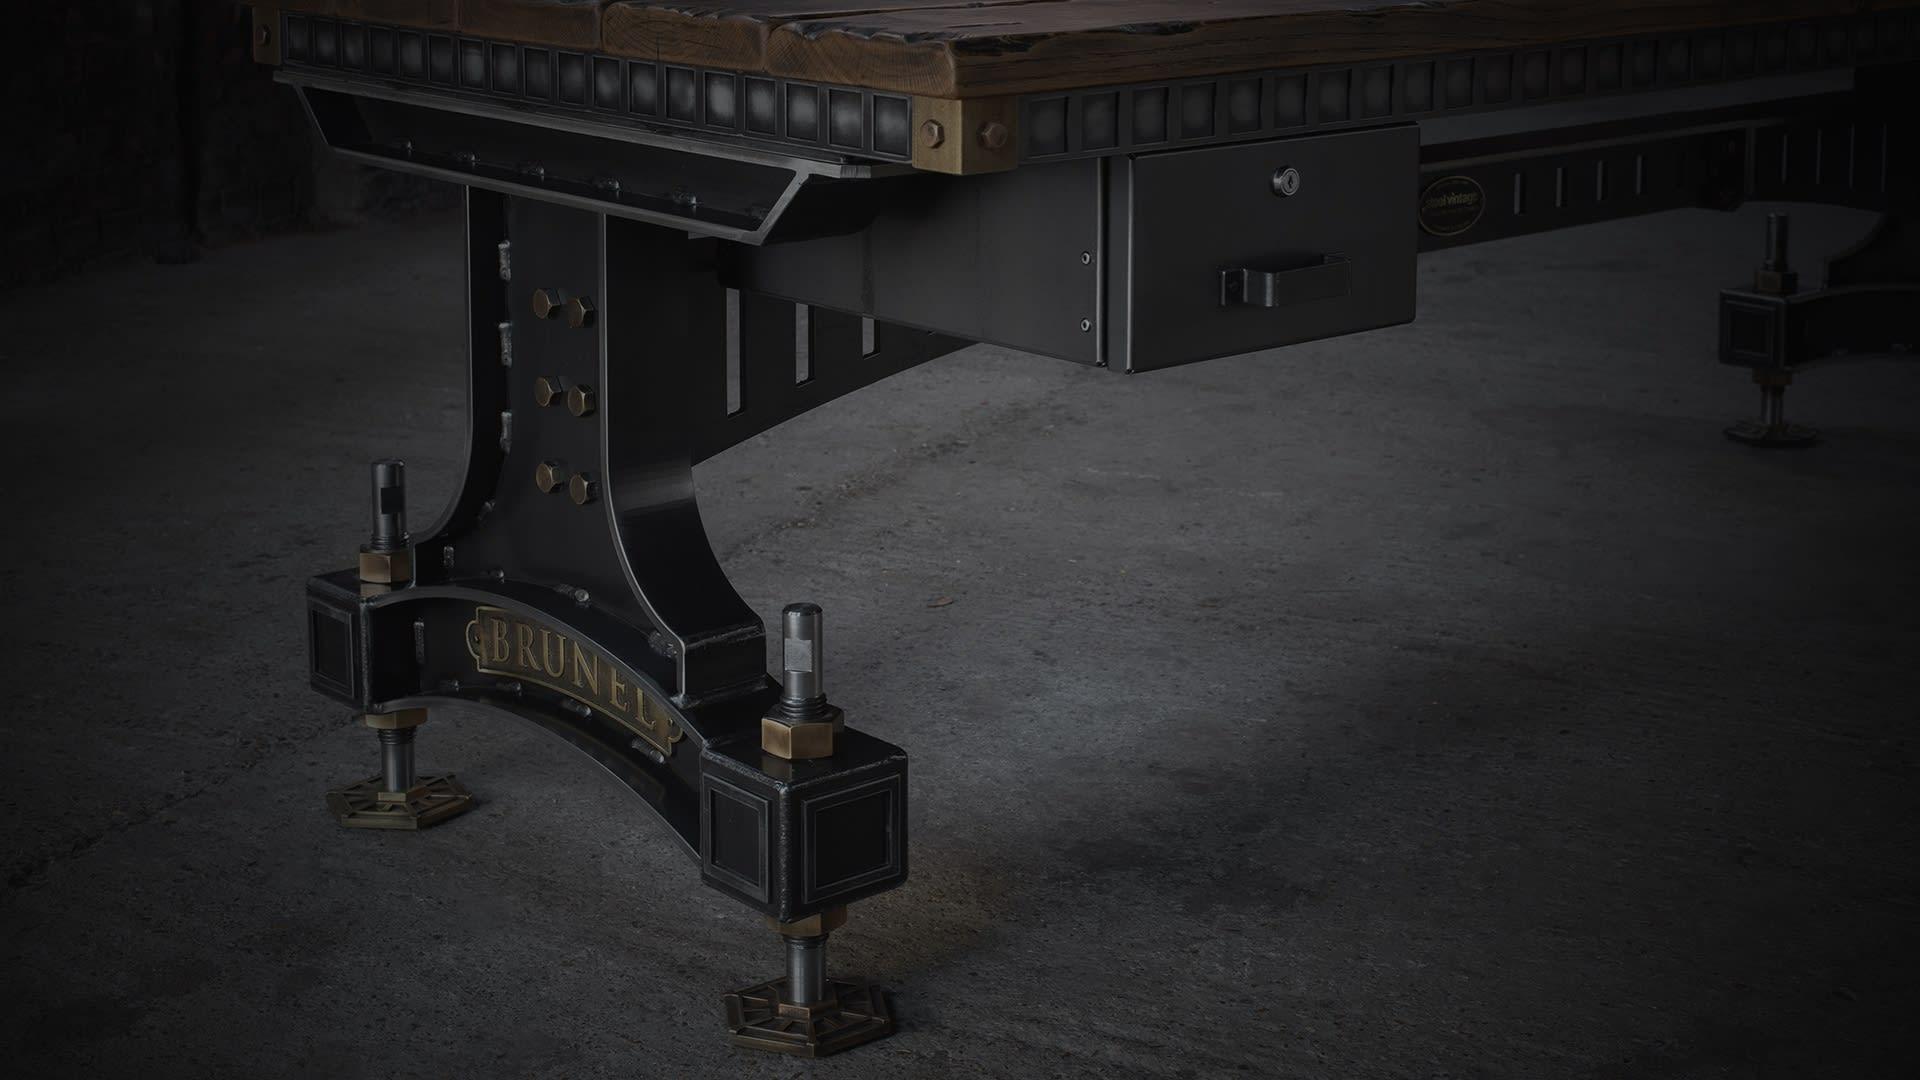 SV brunel desk closeup darkened